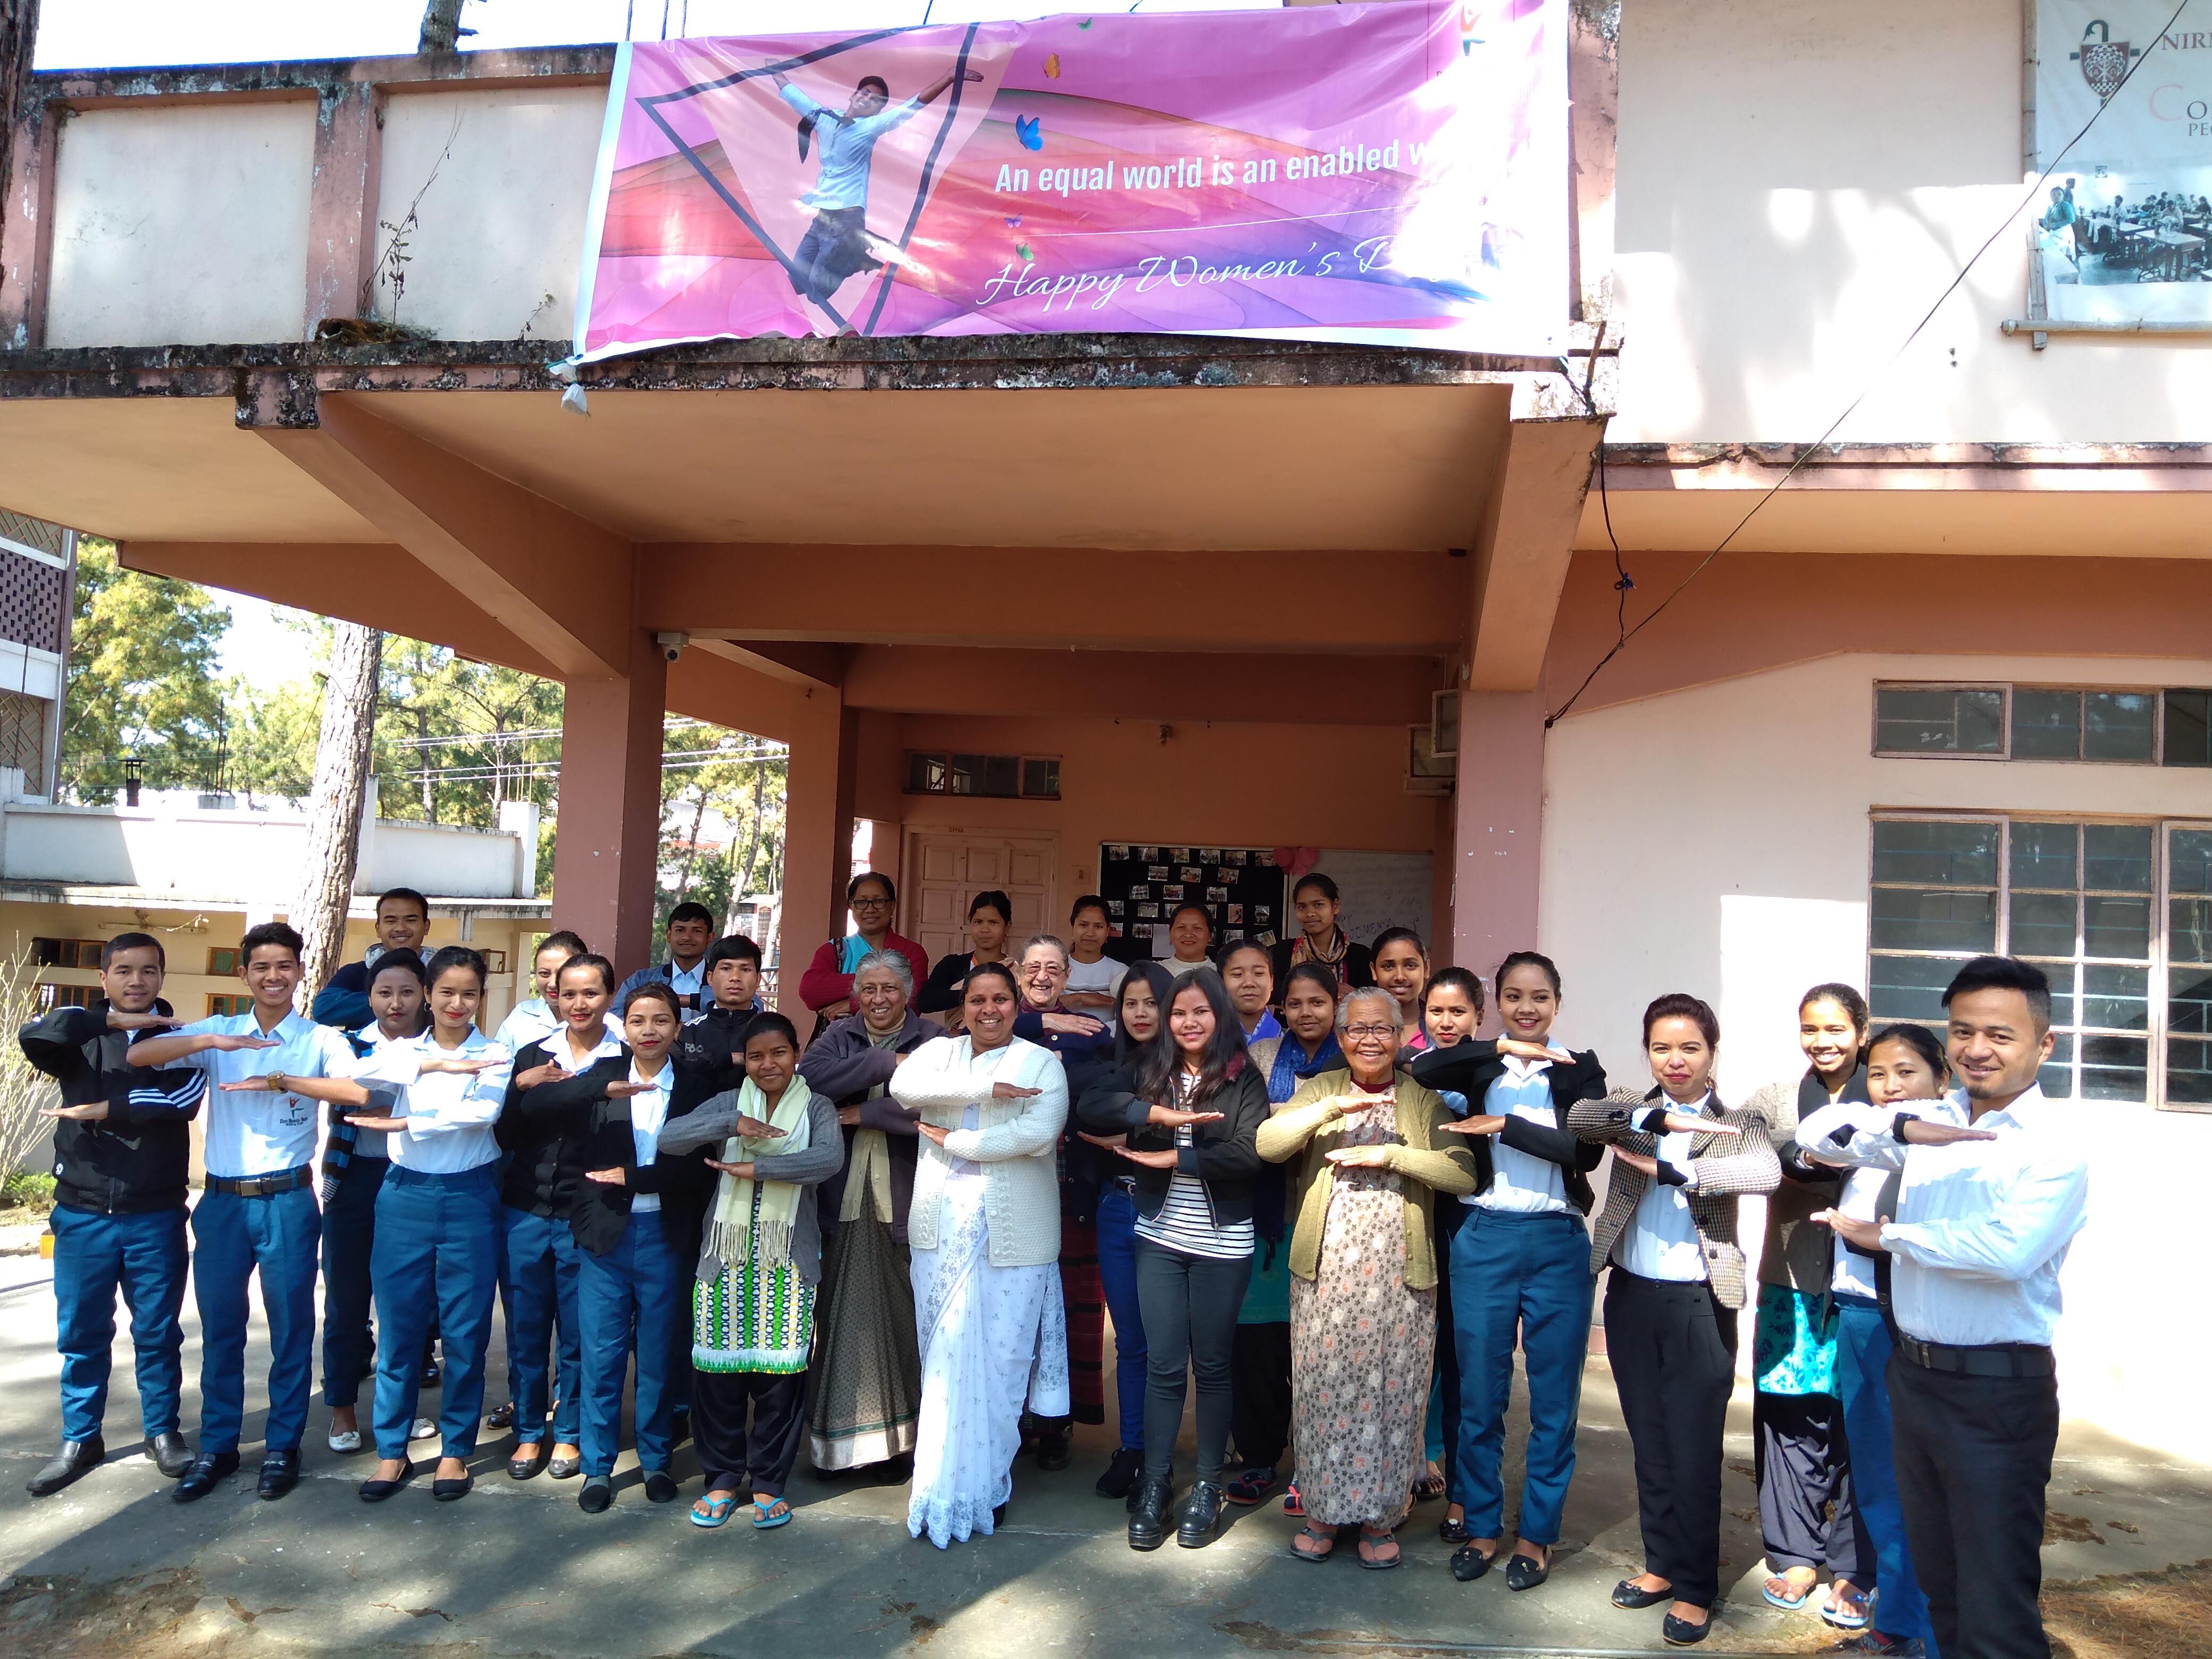 Don Bosco Tech (Berhampur, Odisha) organized a bonding and